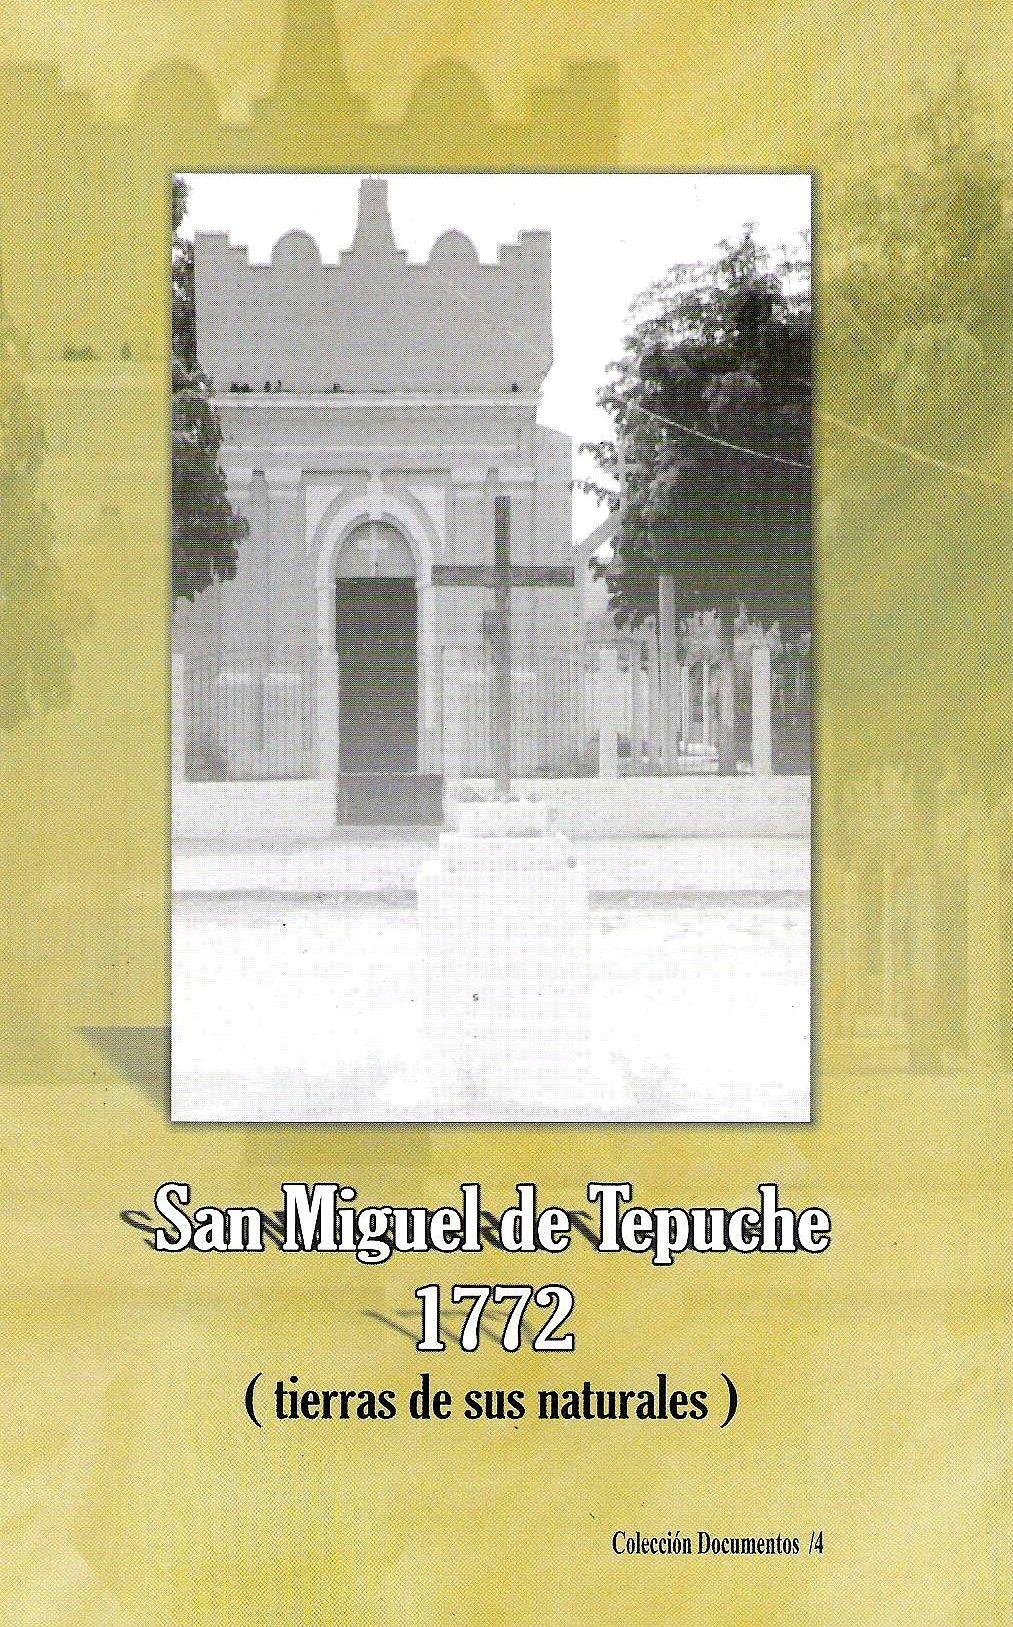 San Miguel de Tepuche 1772 (tierras de sus naturales)